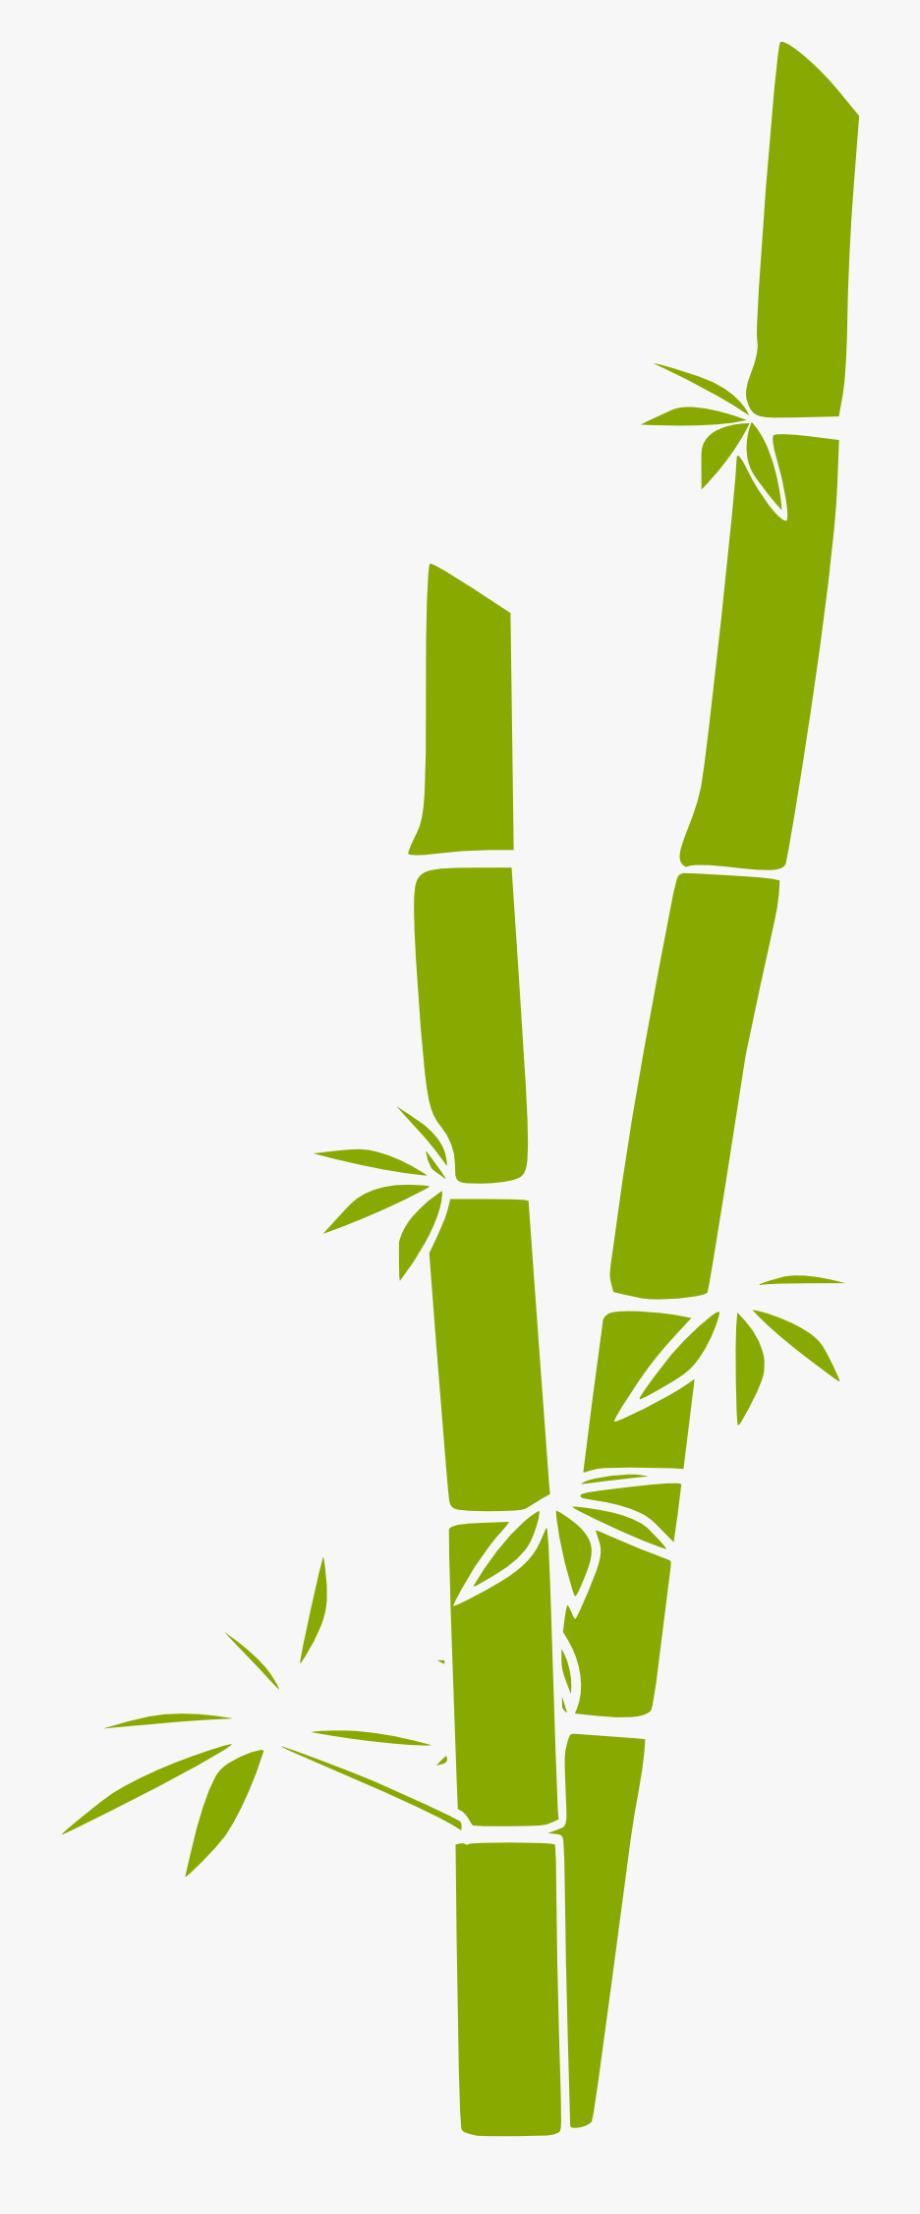 clipart transparent Bamboo clipart. Transparent cartoon free cliparts